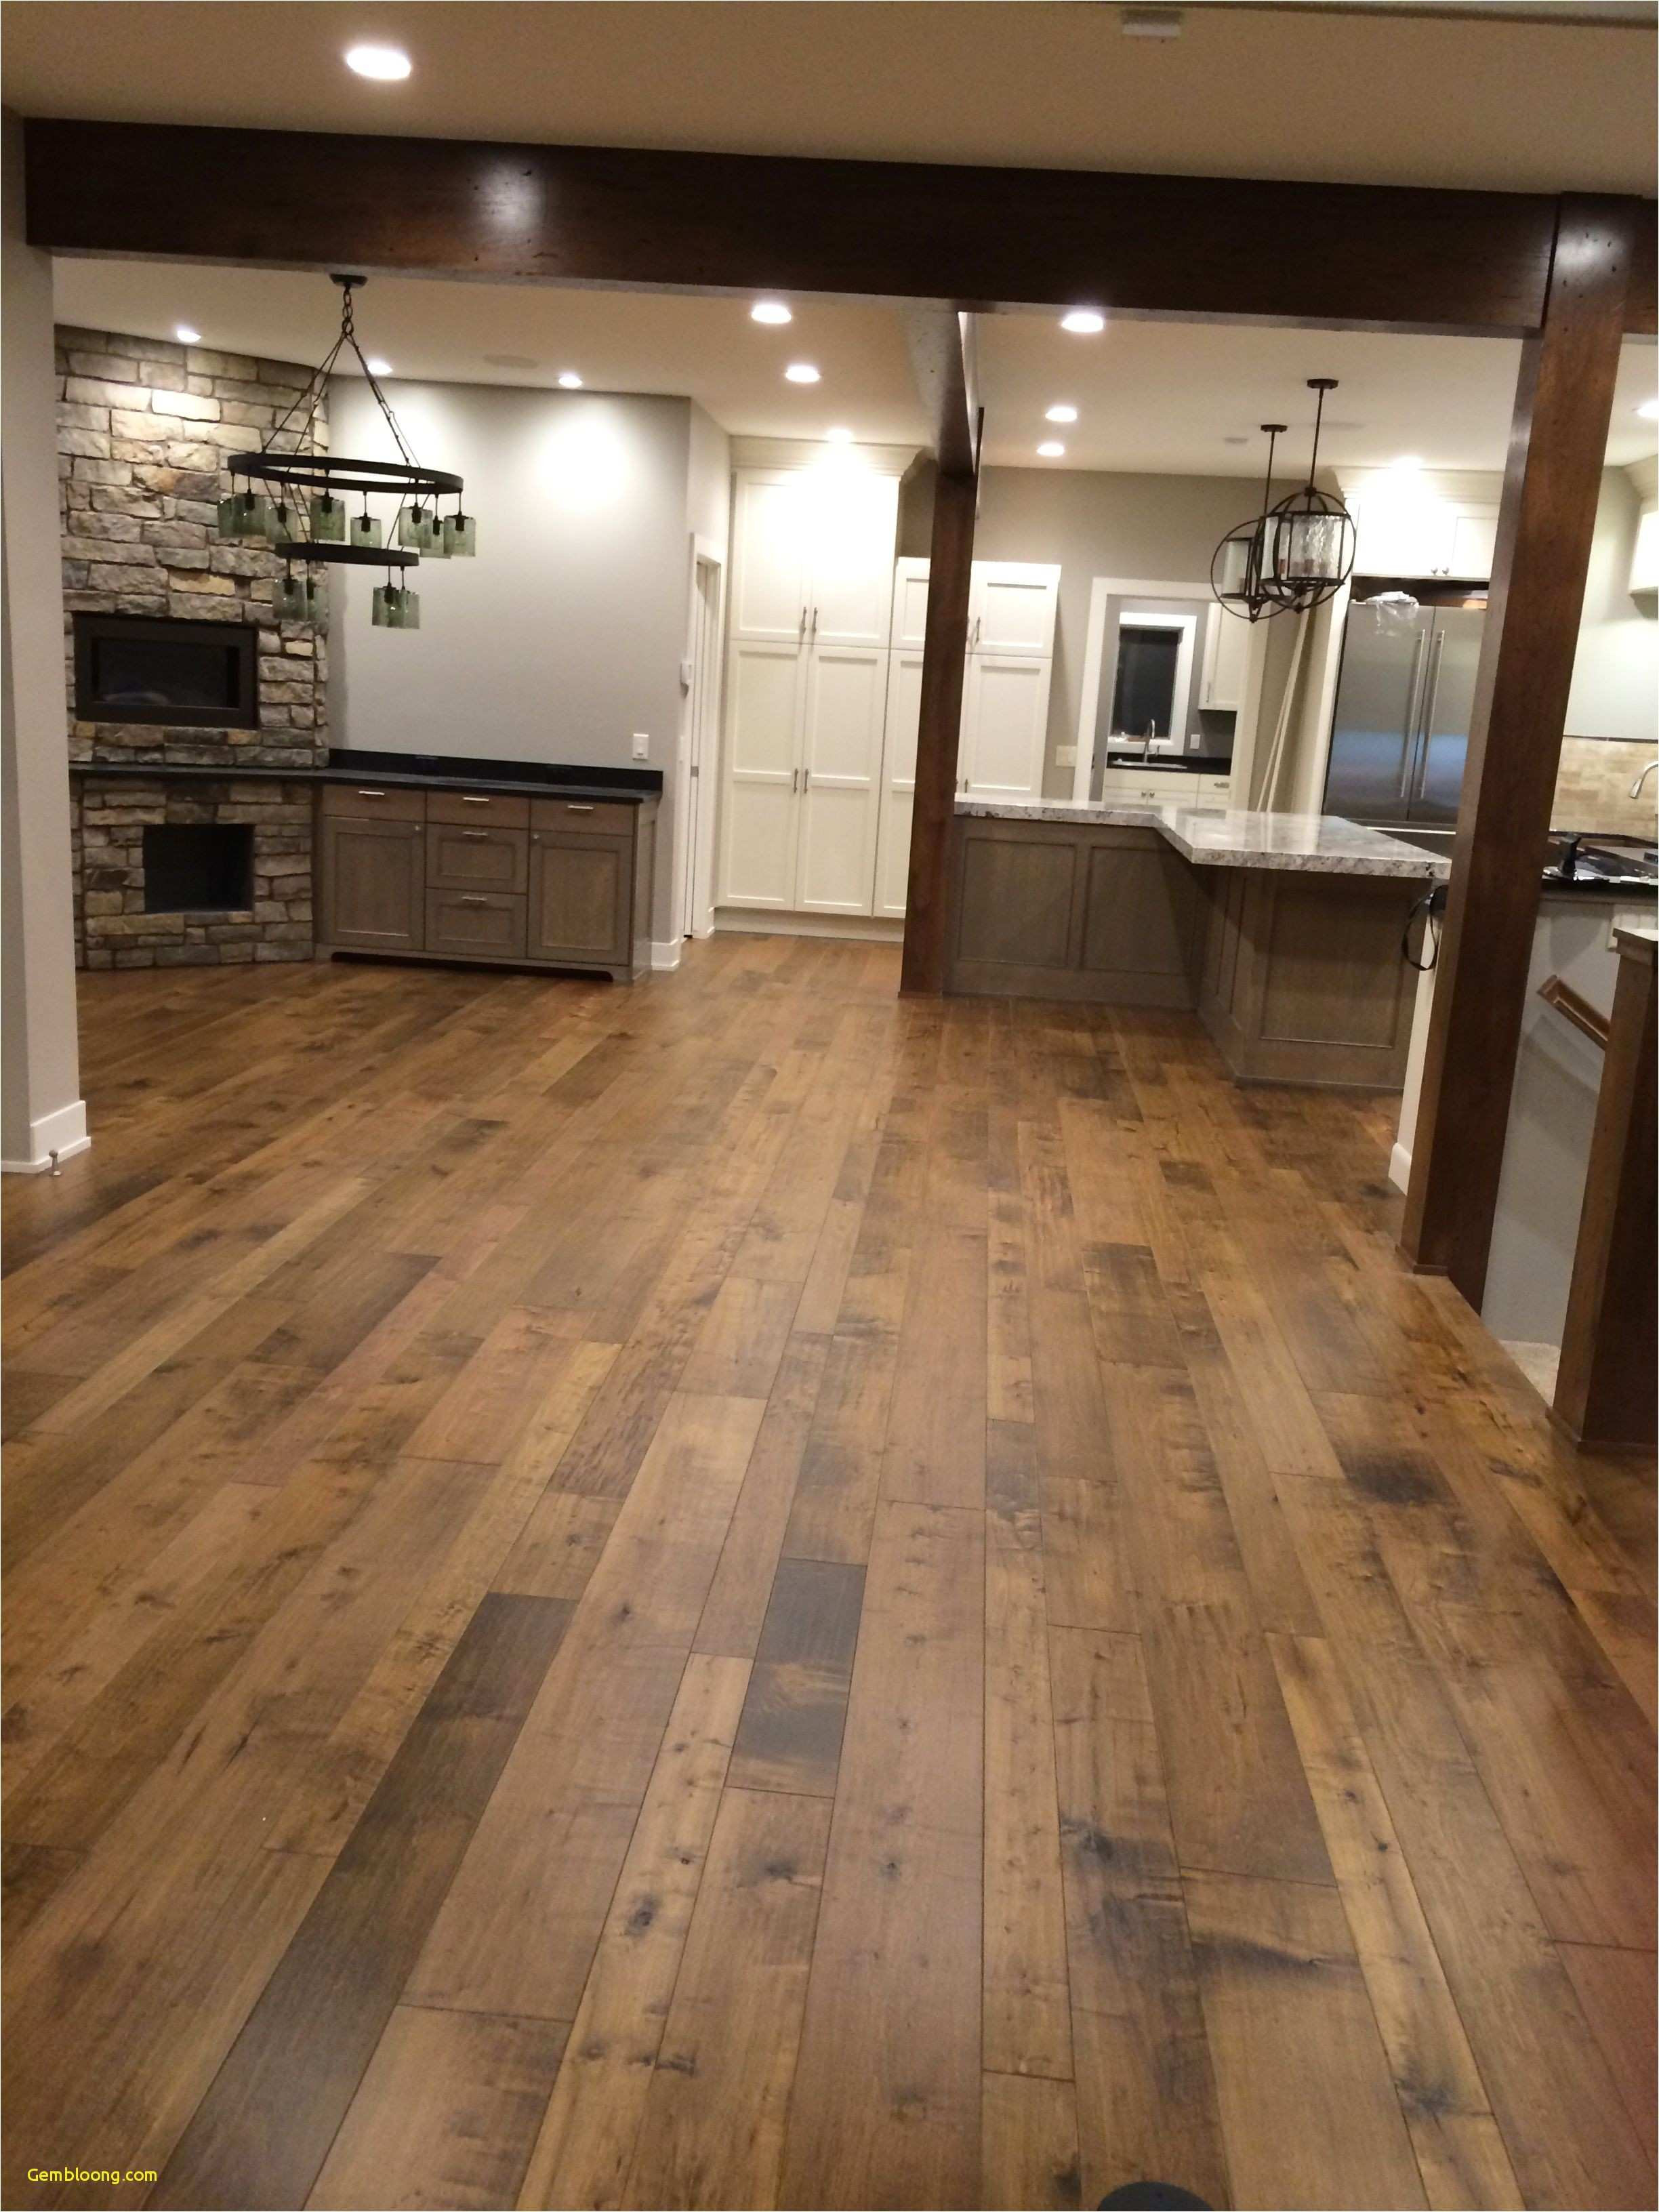 clearance hardwood flooring of wood for floors facesinnature throughout hardwood flooring stores near me hardwood flooring panies near me flooring sale near me stock 0d